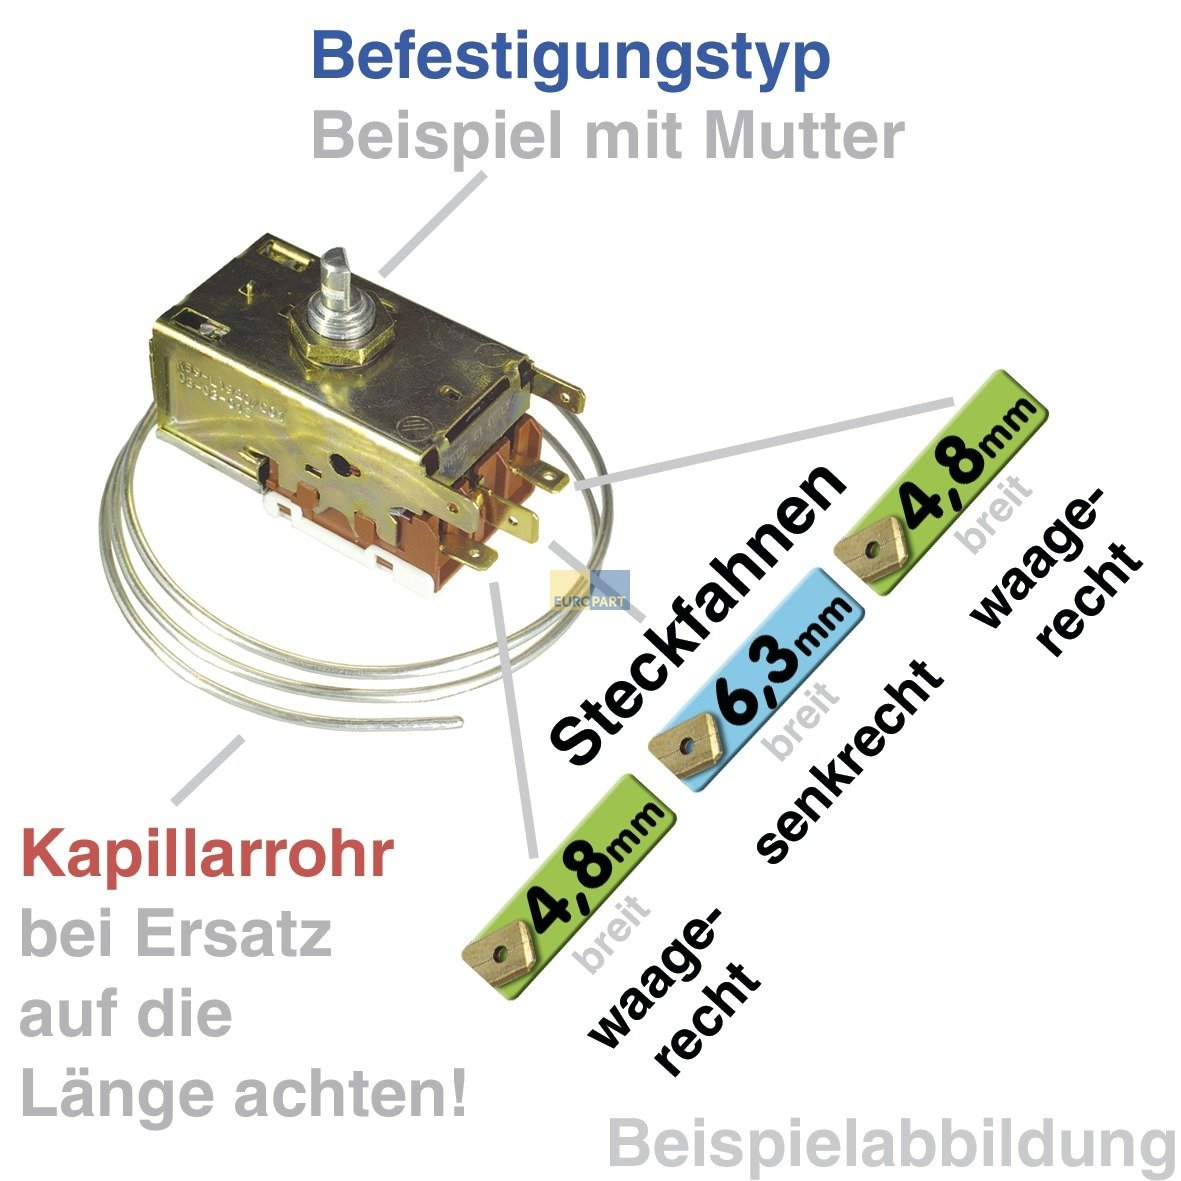 Thermostat K/ühlthermostat 0-Sterne-K/ühlschr/änke Original Bosch Siemens 00170157 Danfoss 077B6698 460mm Kapillarrohr 3x4,8//1x6,3mm AMP passend Balay Constructa DeDietrich Gaggenau K/üppersbusch Miele